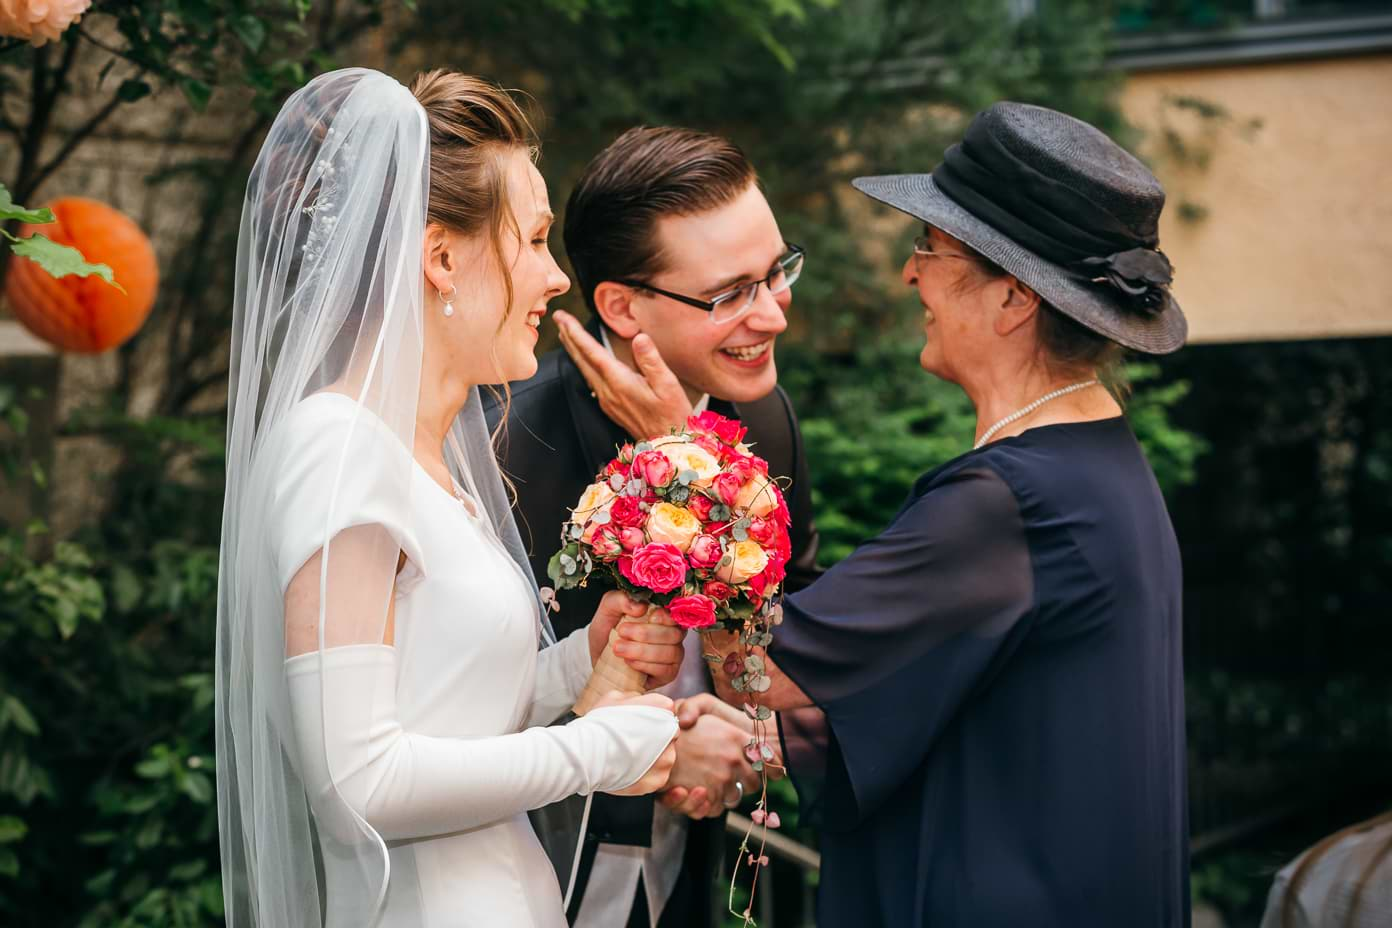 Gratualtionen an das Brautpaar